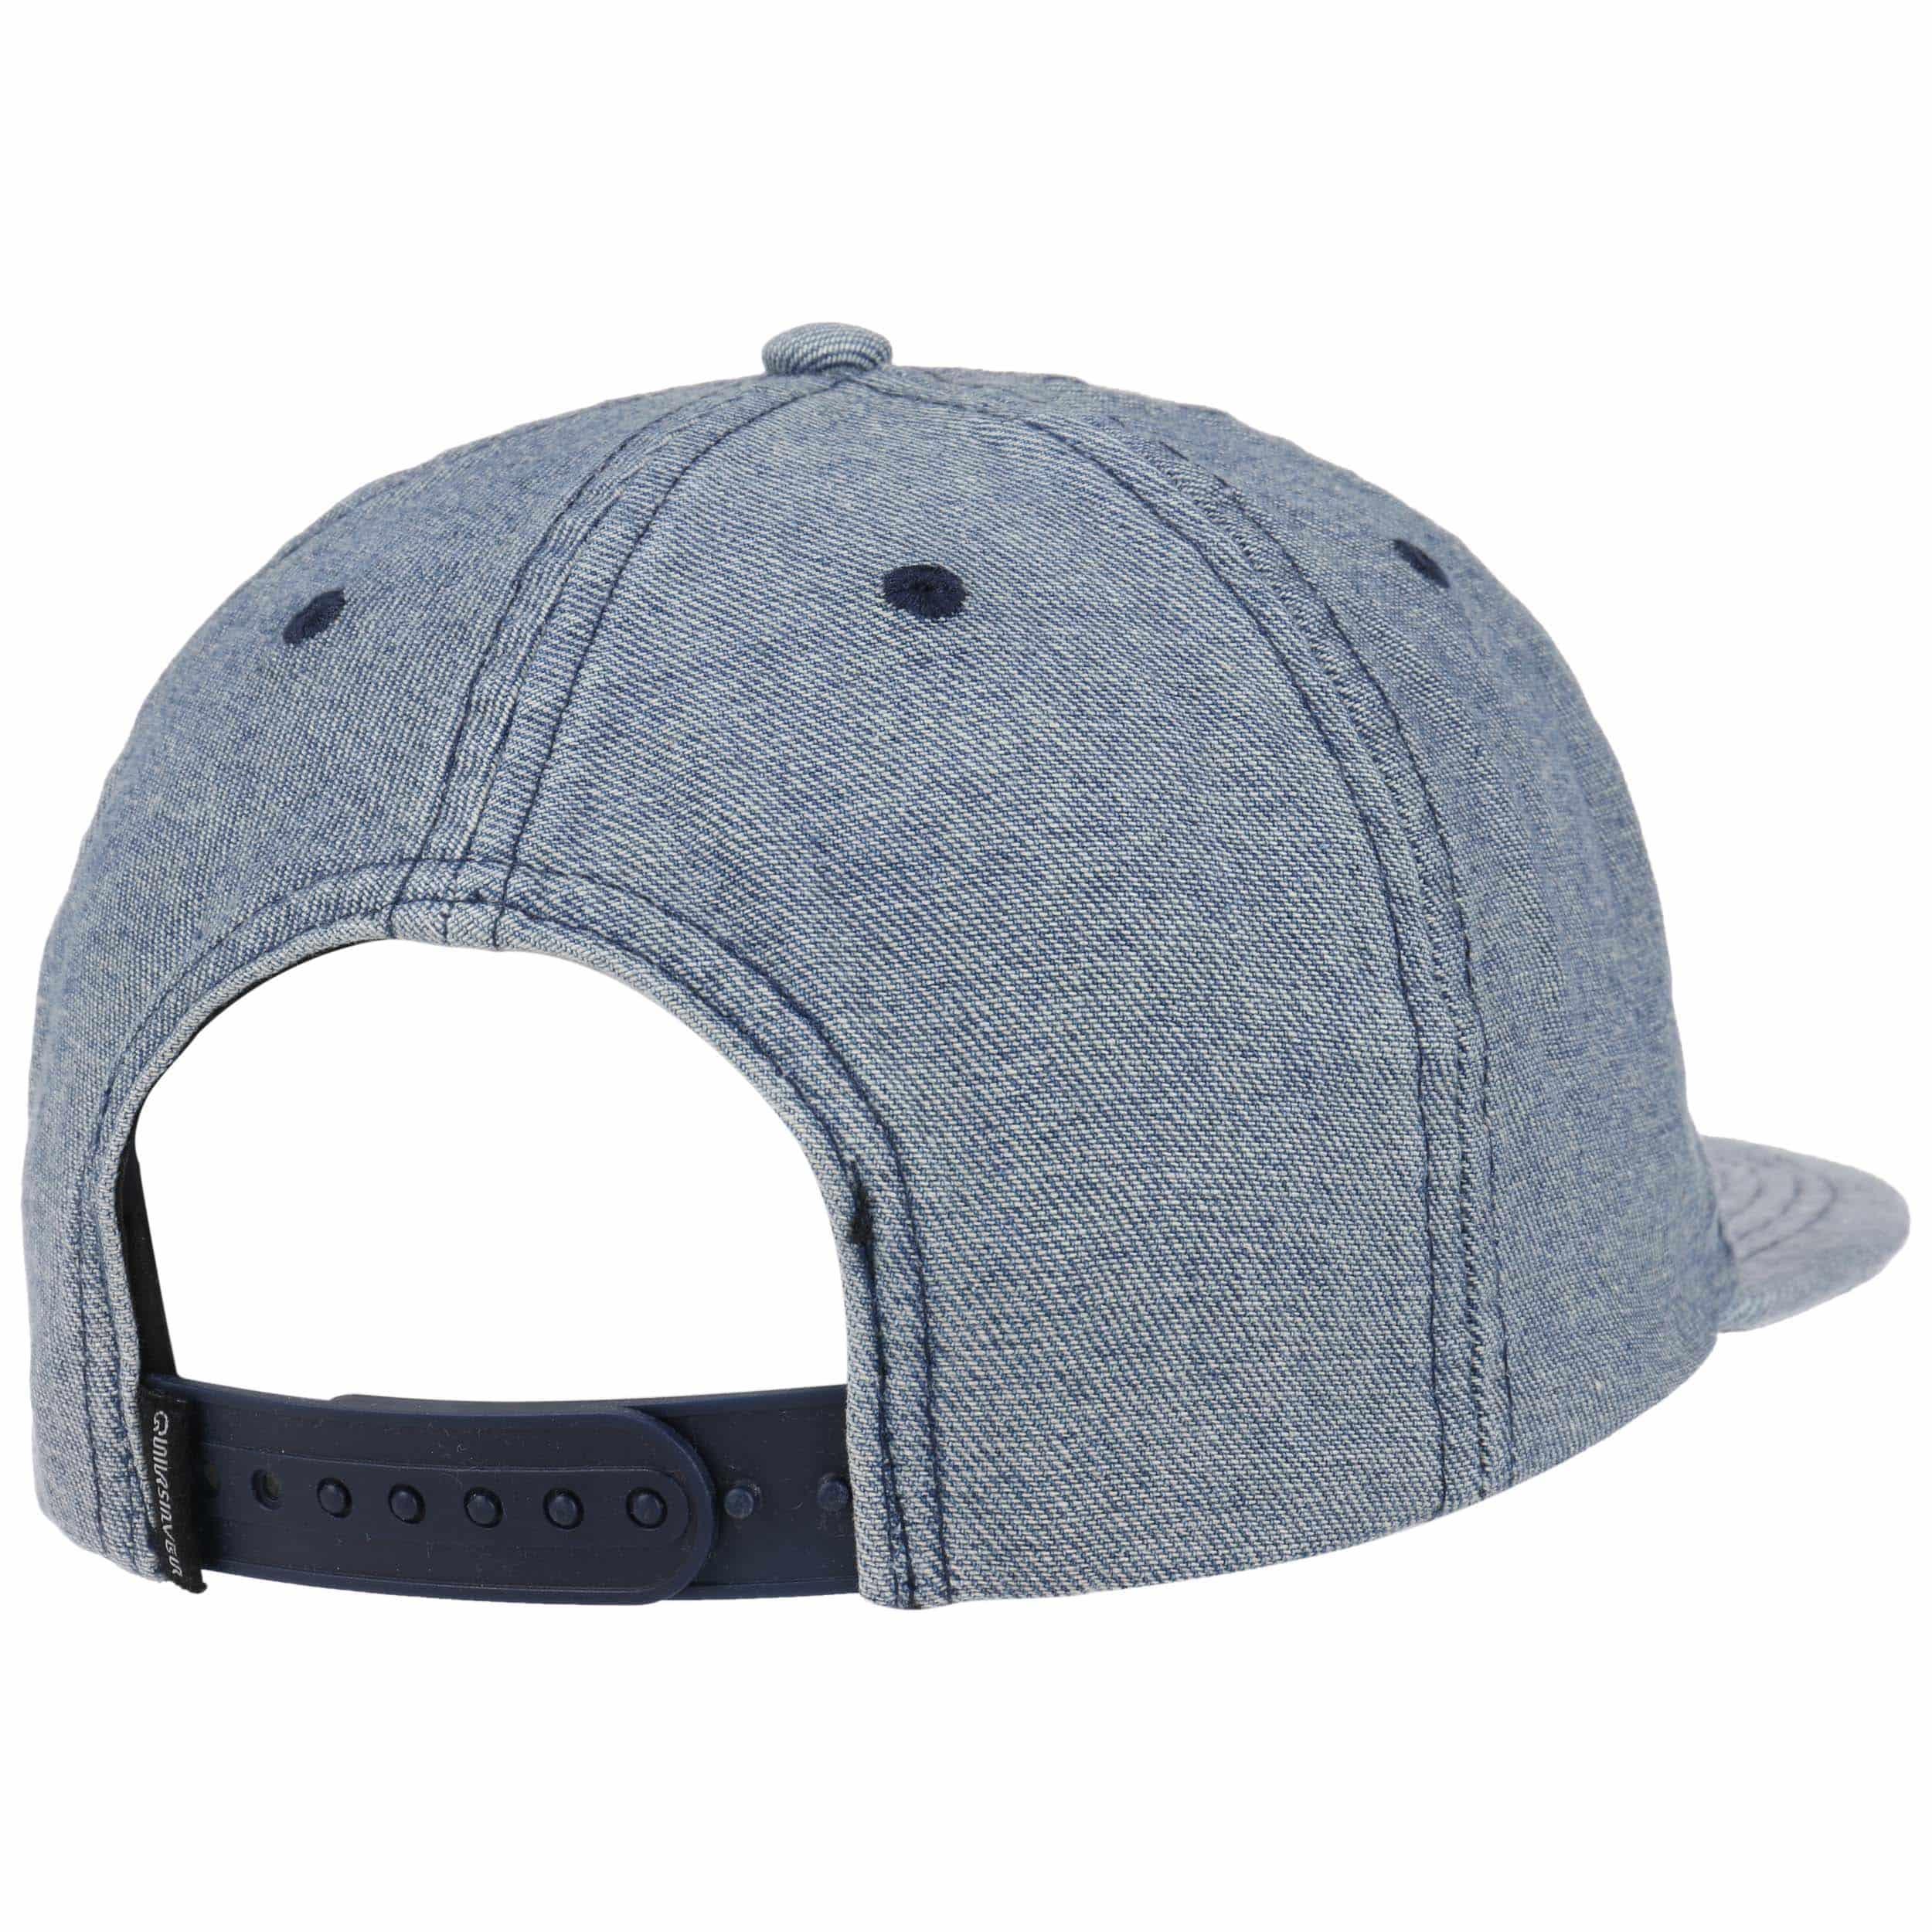 best loved 6d022 2dad8 ... hat black one size d99a8 58195 ireland pinchfield snapback cap by  quiksilver blue 1 0672f 28335 ...